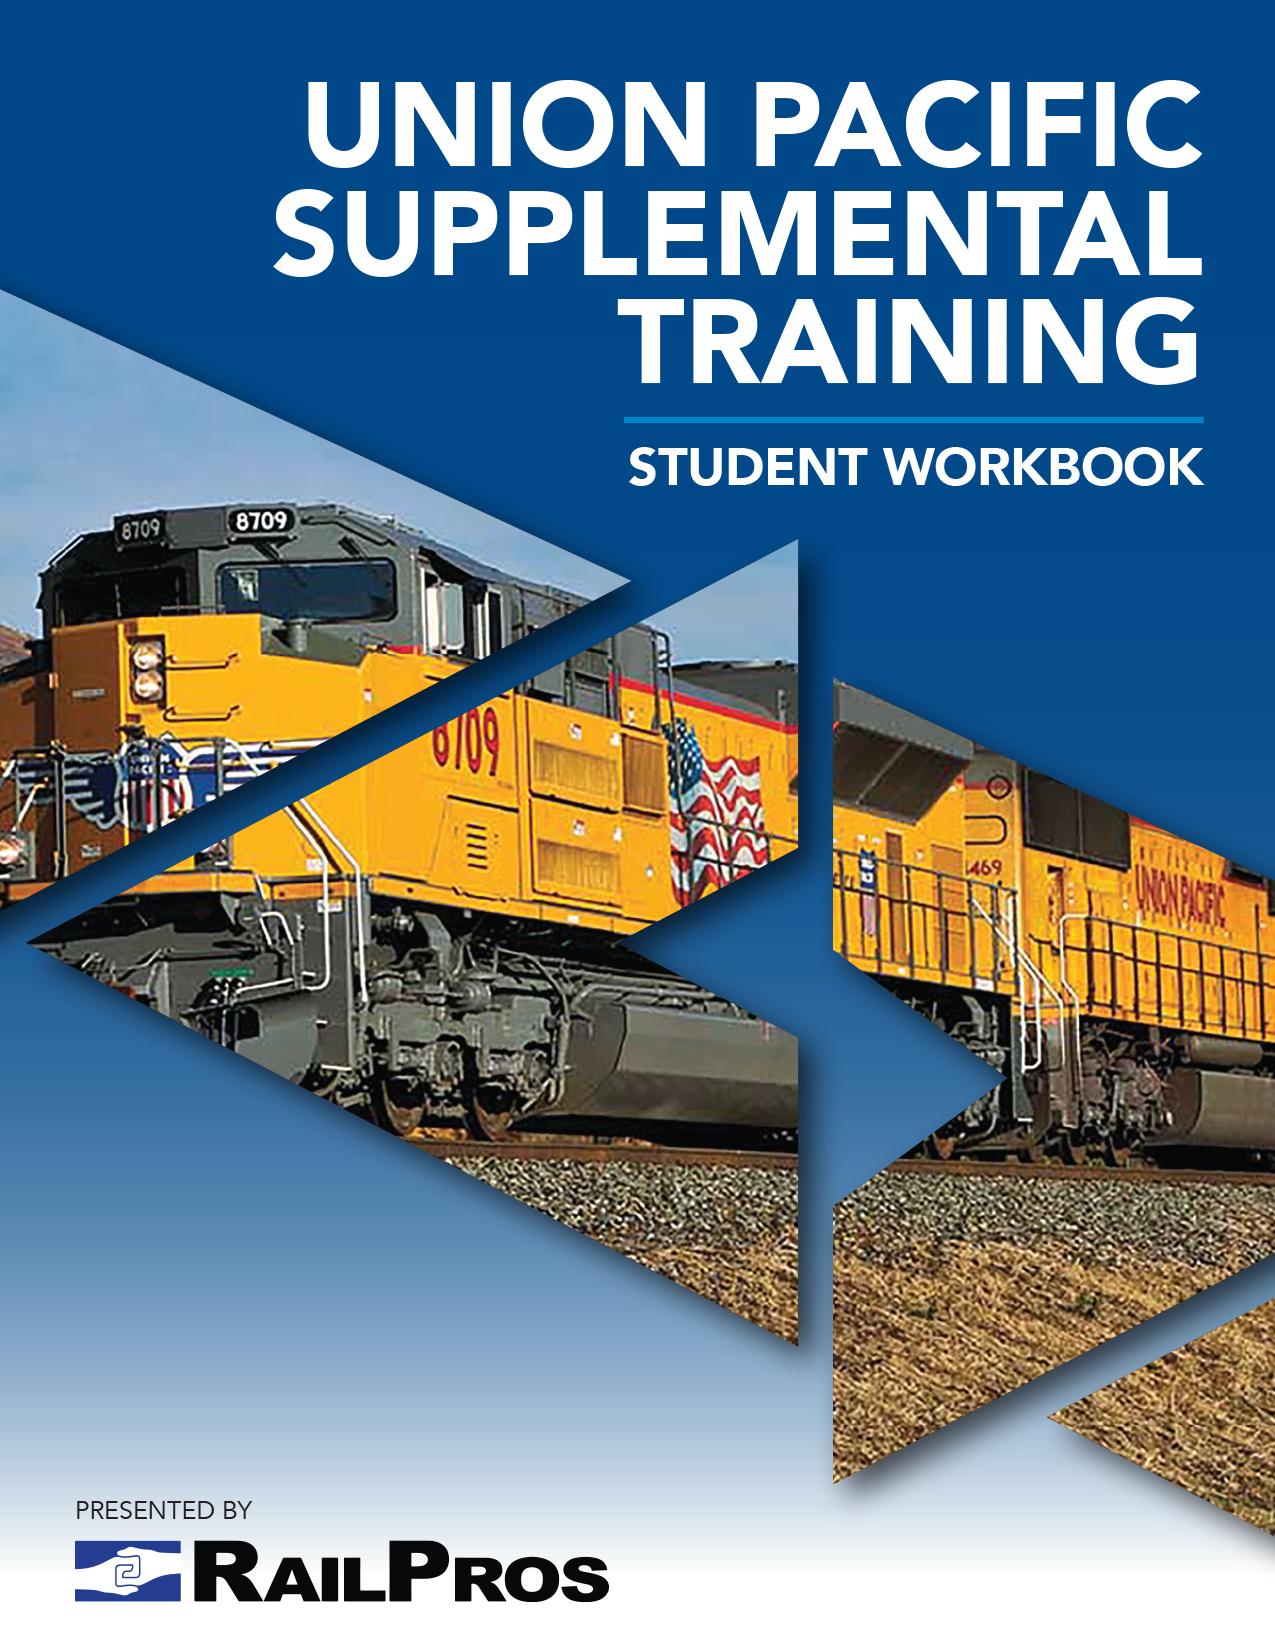 Union Pacific Supplemental Training Student Workbook